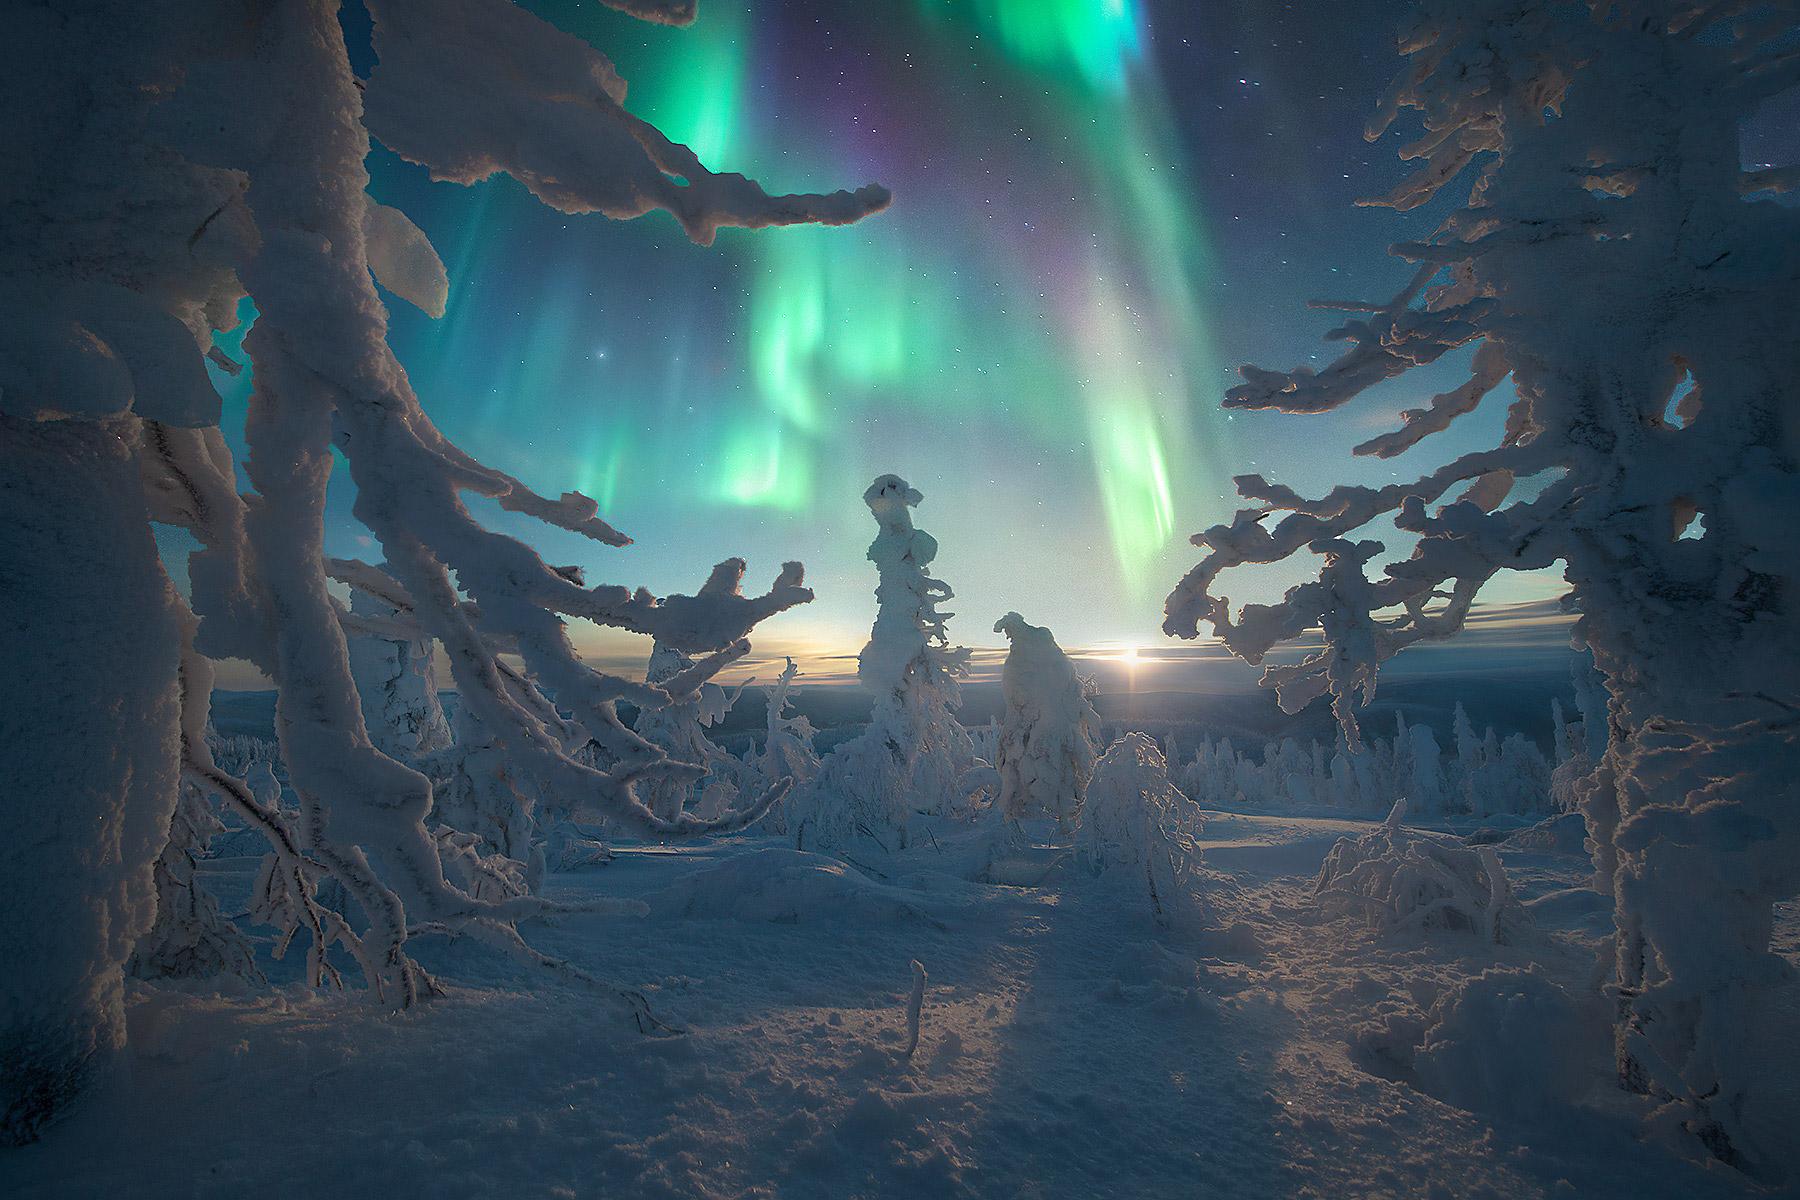 The Aurora Borealis between snowy trees at moonrise in Alaska